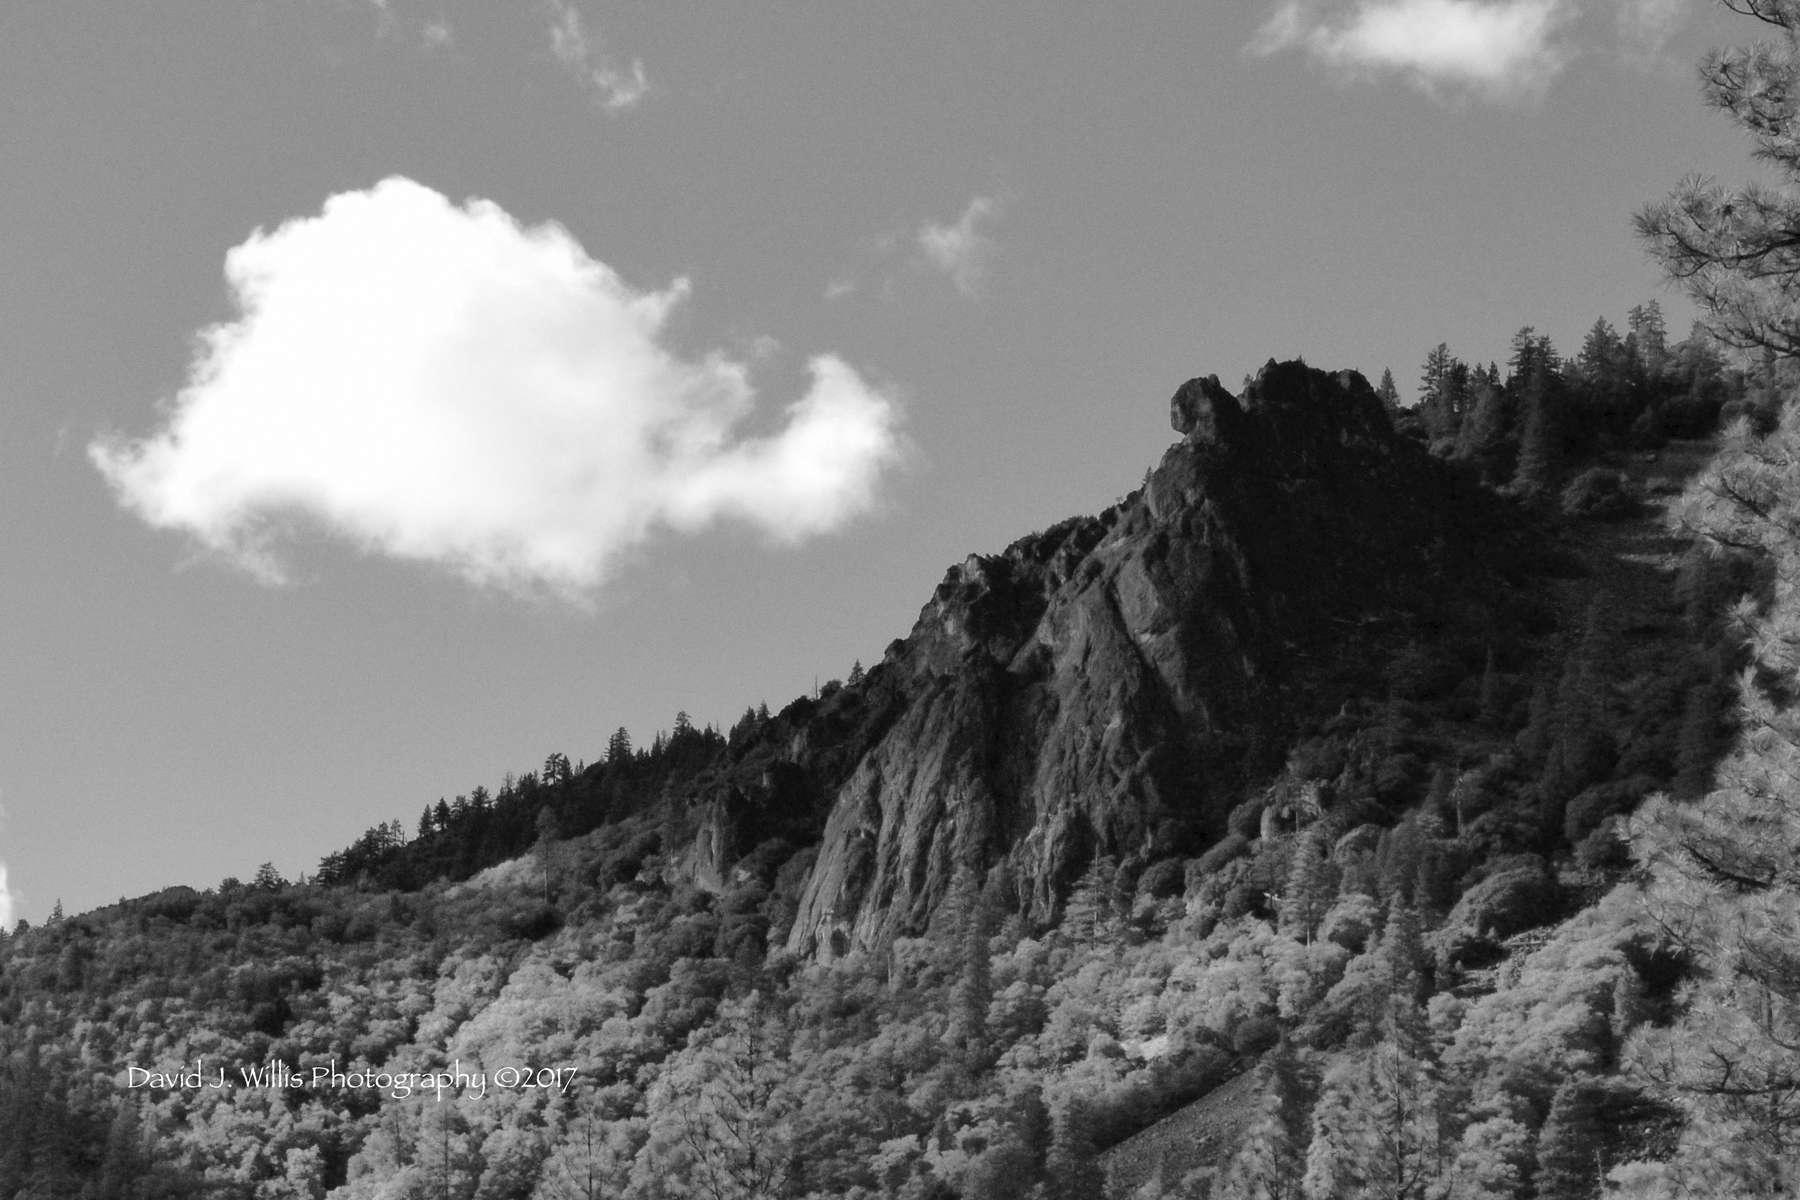 Cougar Rock II, Genessee Valley, Plumas County